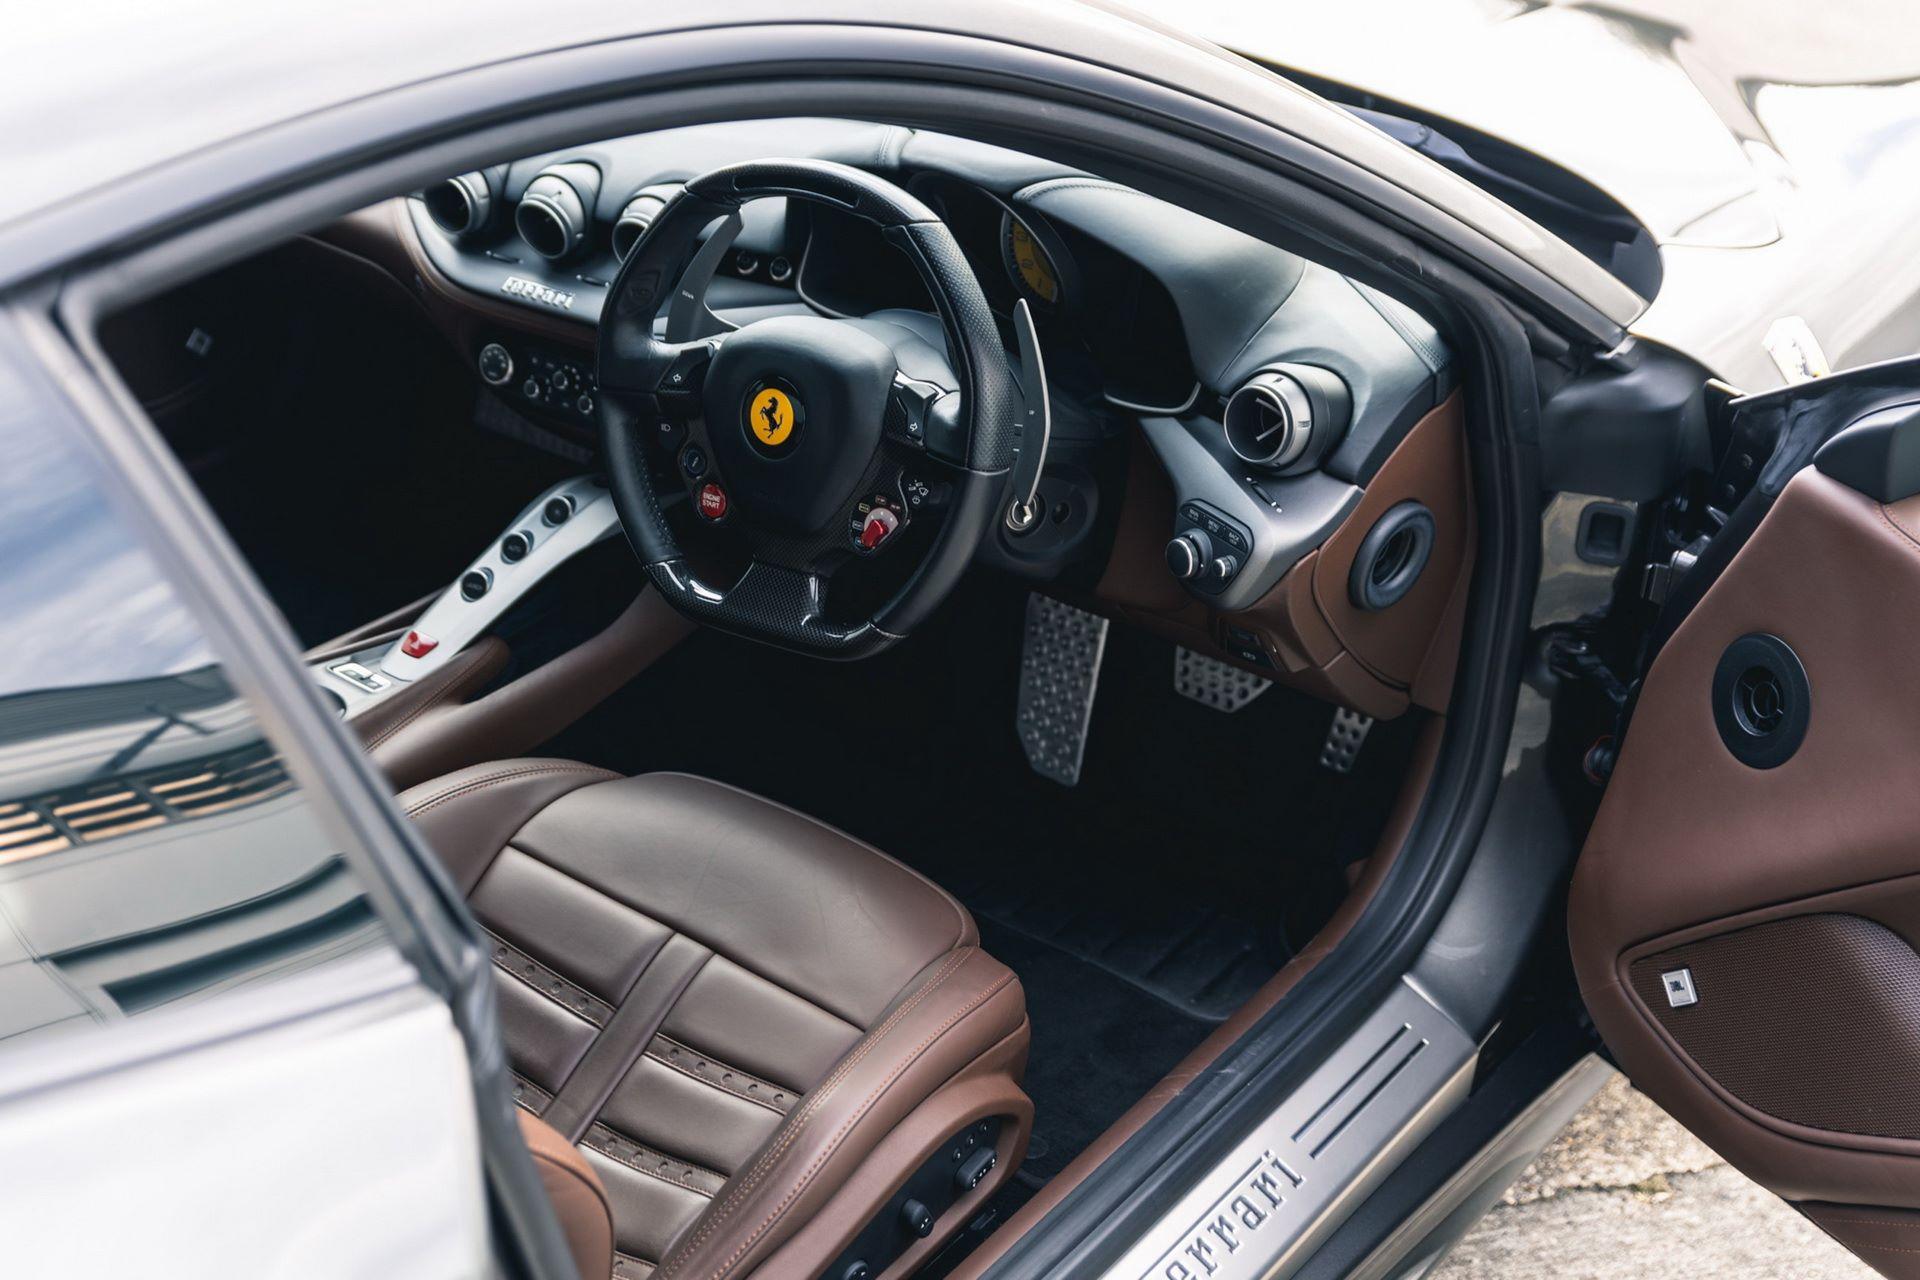 Ferrari-F12berlinetta-Chris-Harris-24